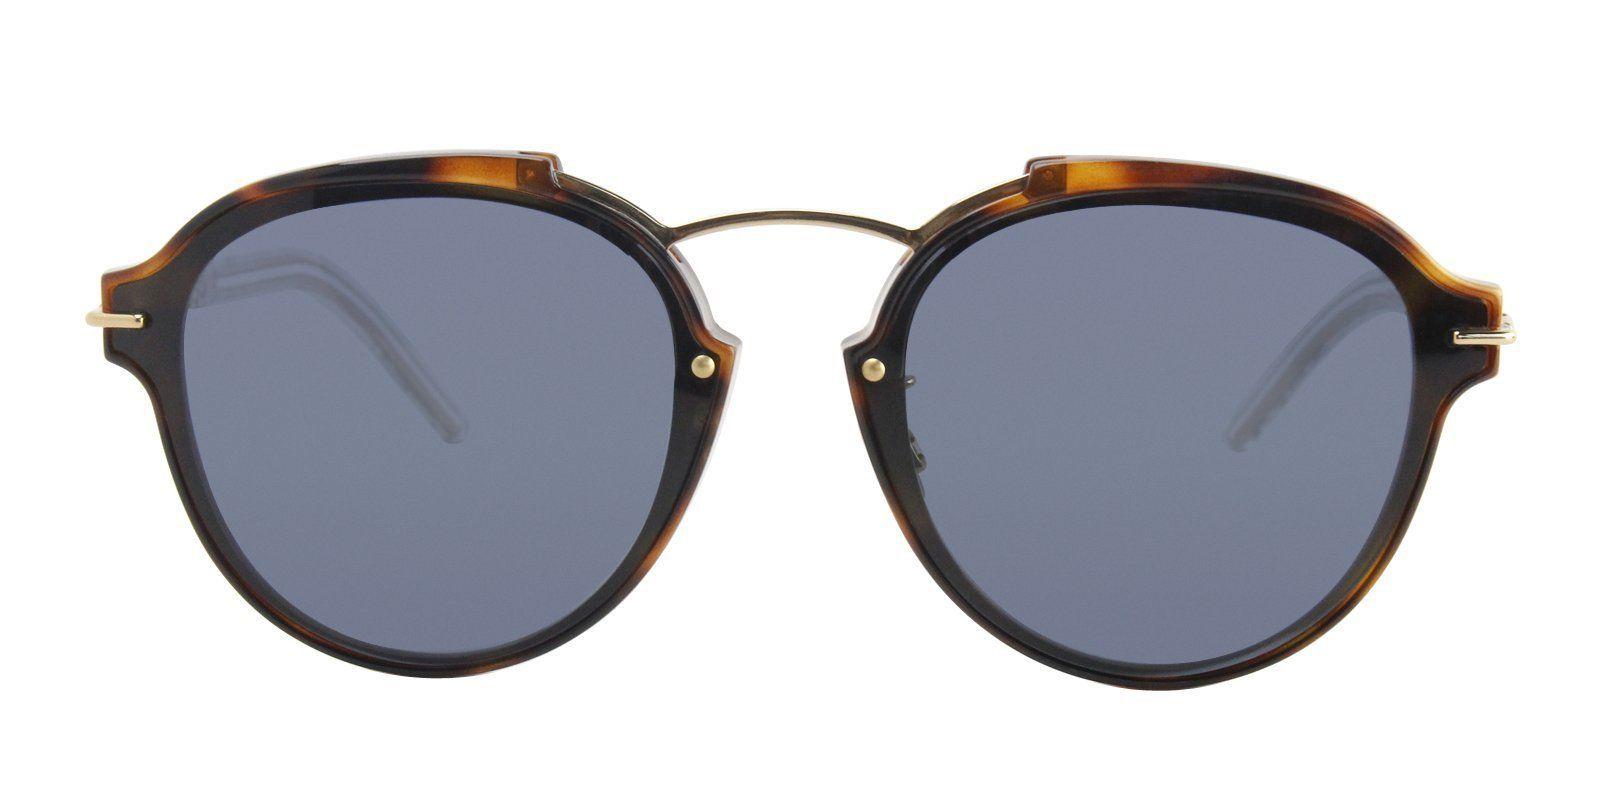 c7a29a284e Dior - Abstract Tortoise - Gray sunglasses